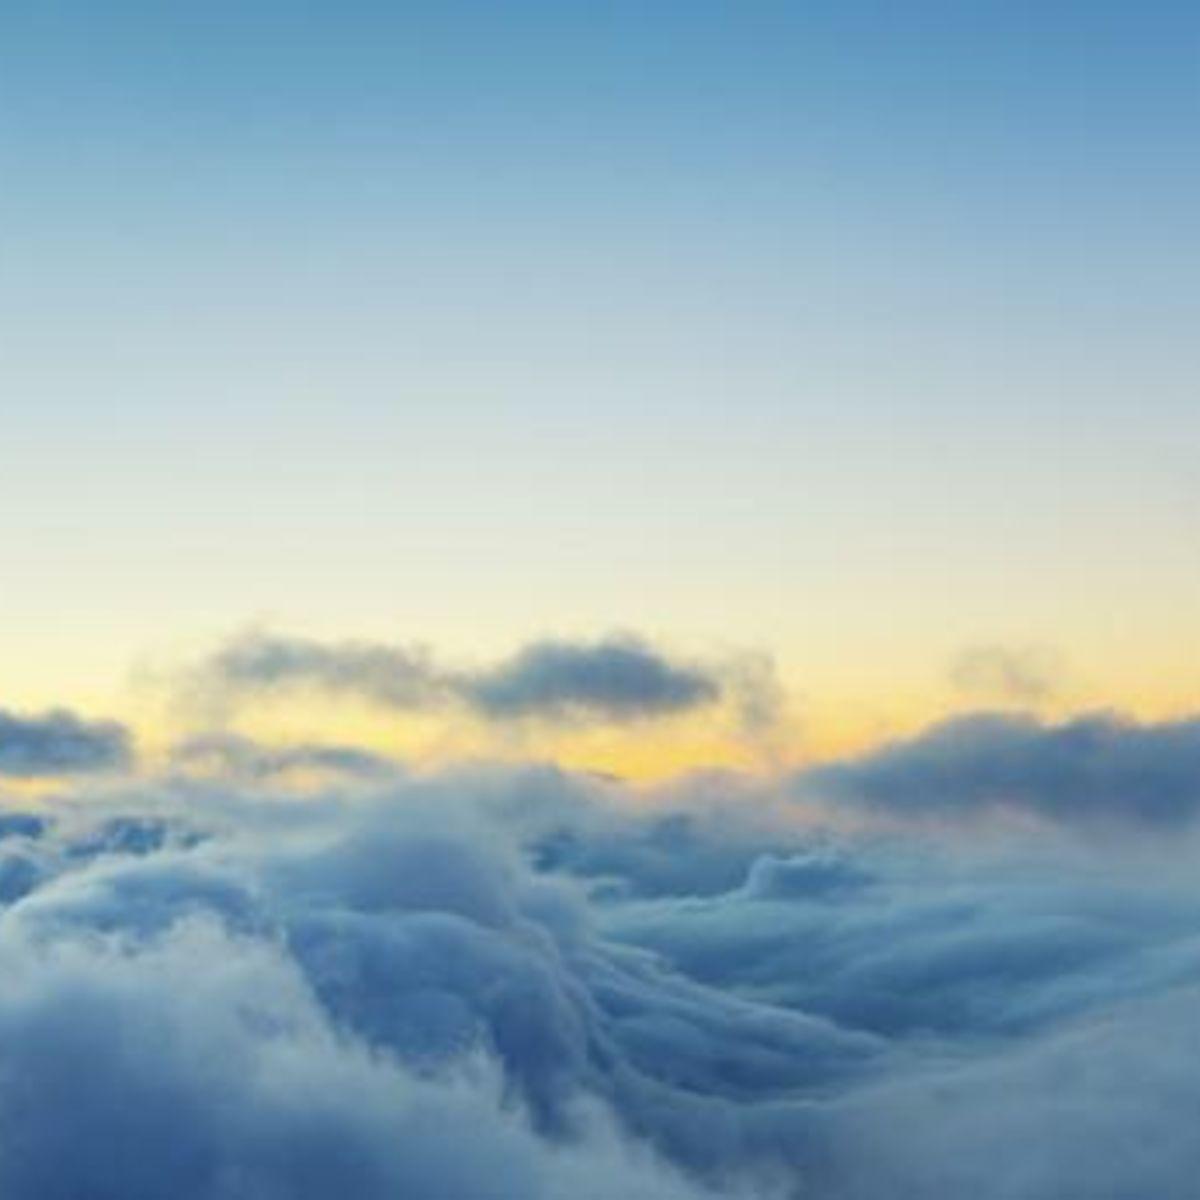 151027_BA_blue-sky.jpg.CROP.rectangle-large.jpg